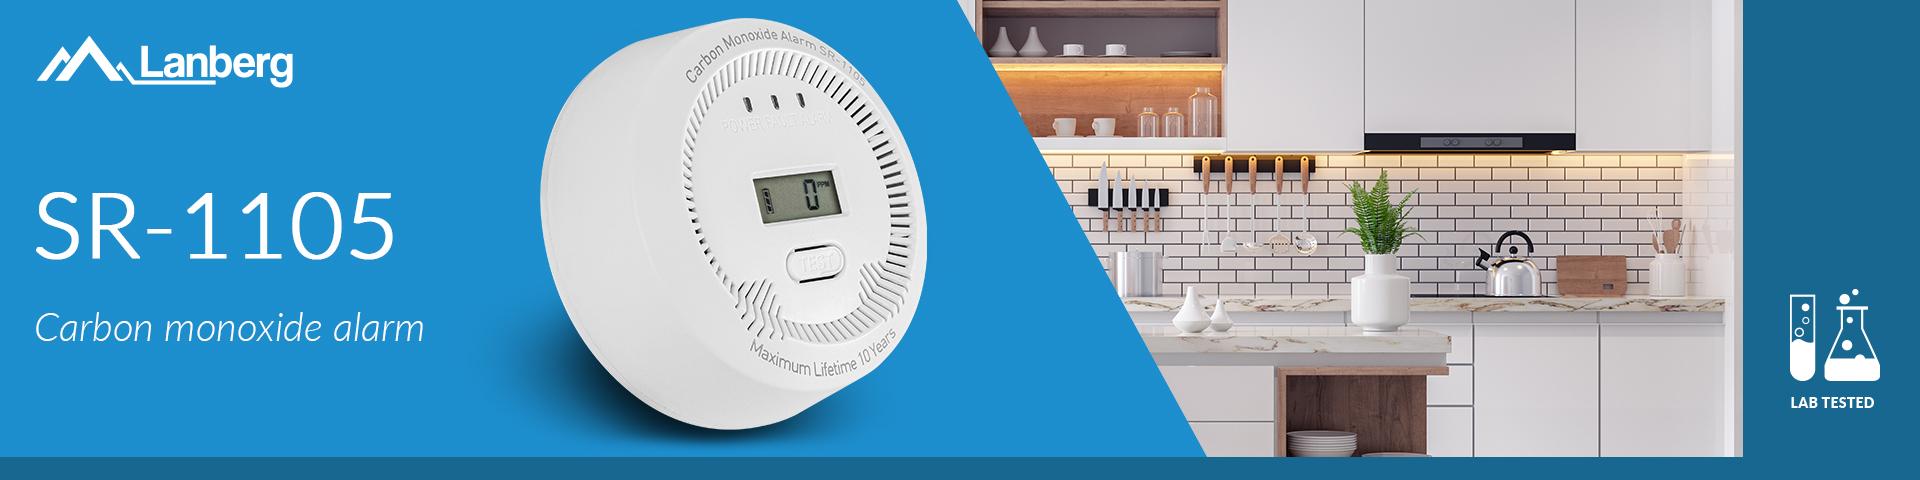 co (carbon monoxide) detector lanberg indoor +bulit-in thermometer 9